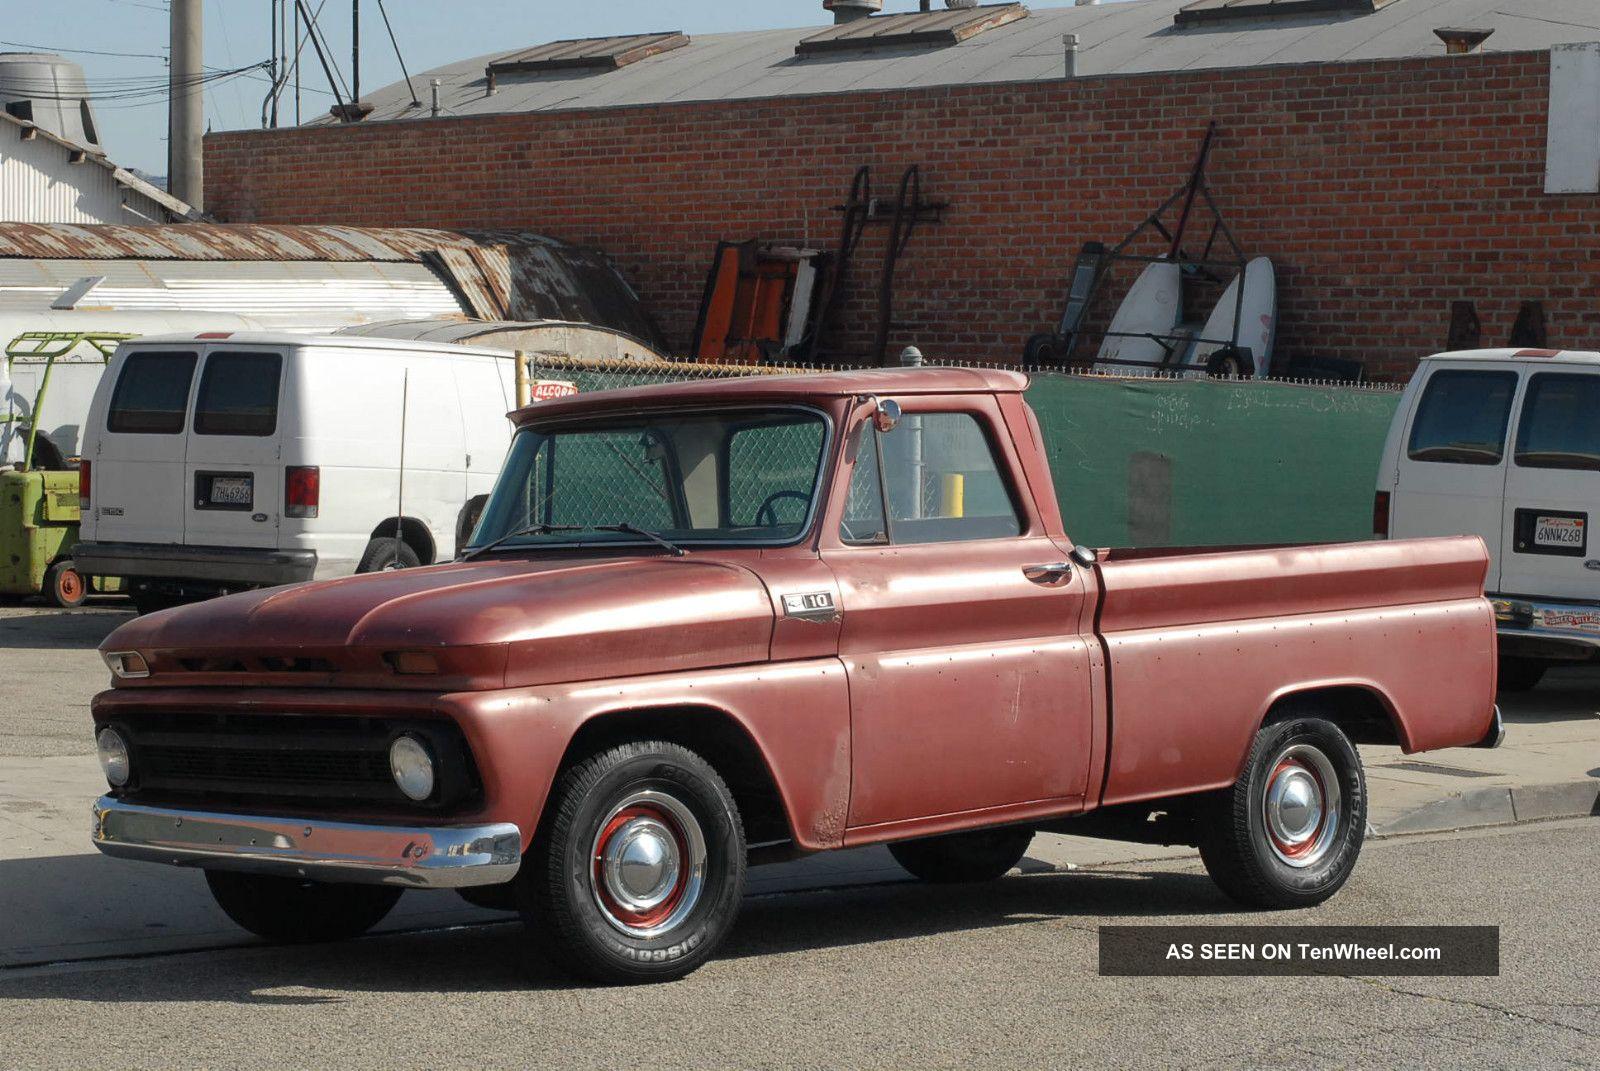 1960,  1961,  1962,  1963,  1964,  1965,  1966 C10 Chevy Swb Big Window Truck Pick Up C-10 photo